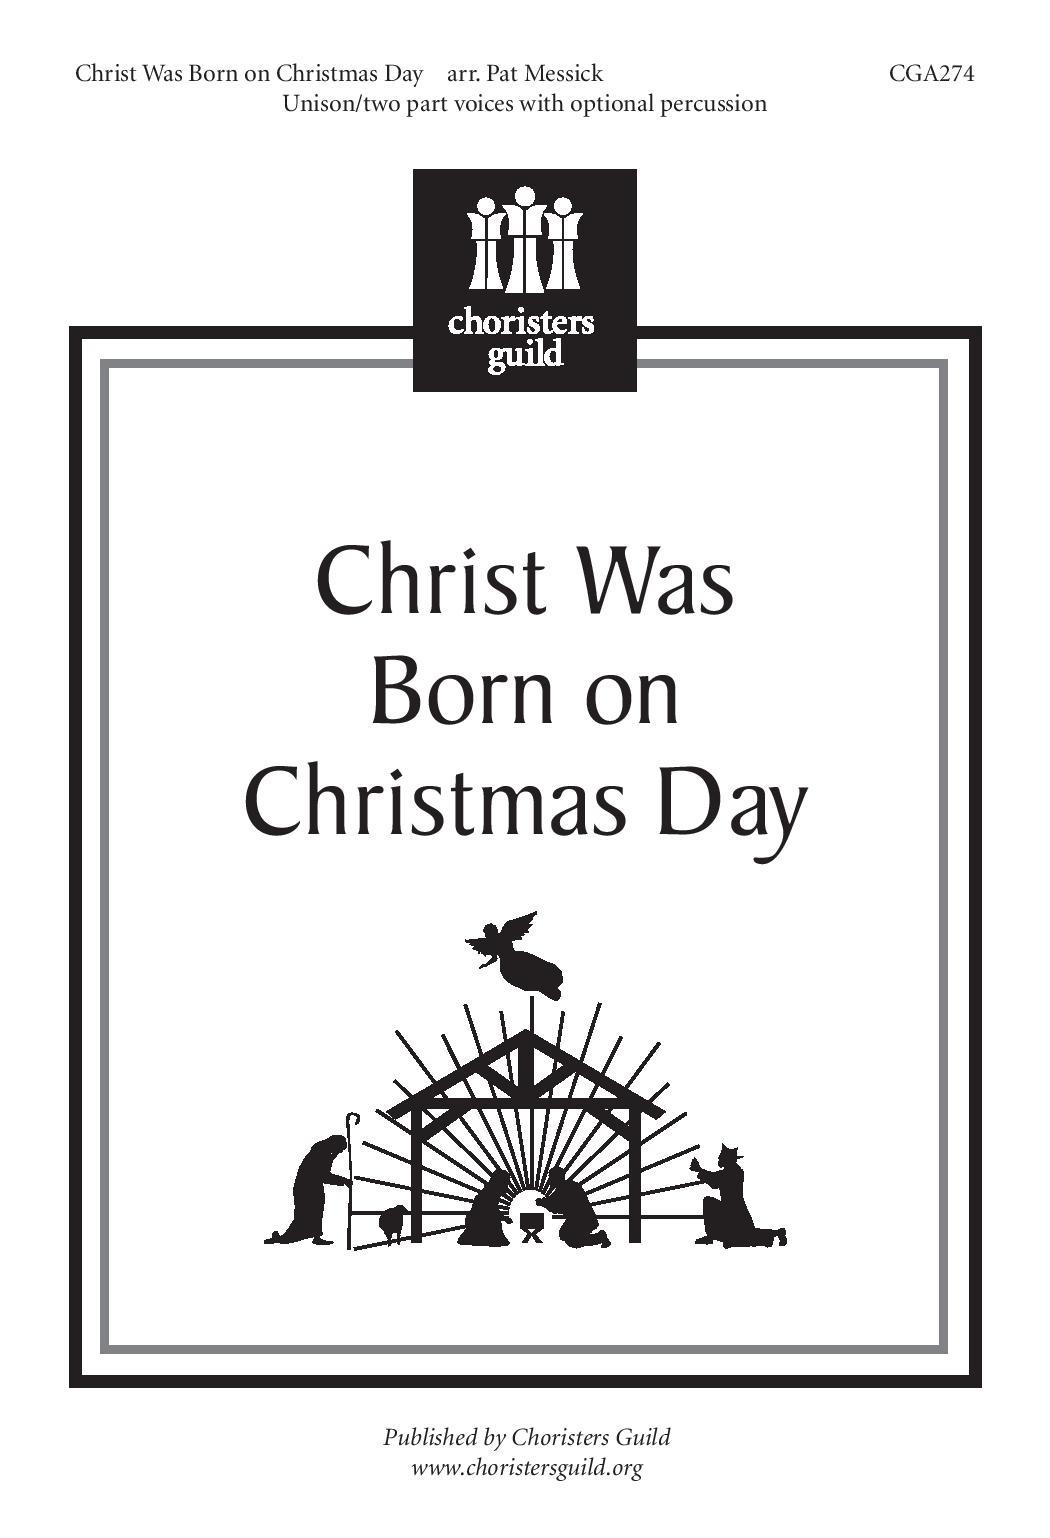 Christ Was Born on Christmas Day